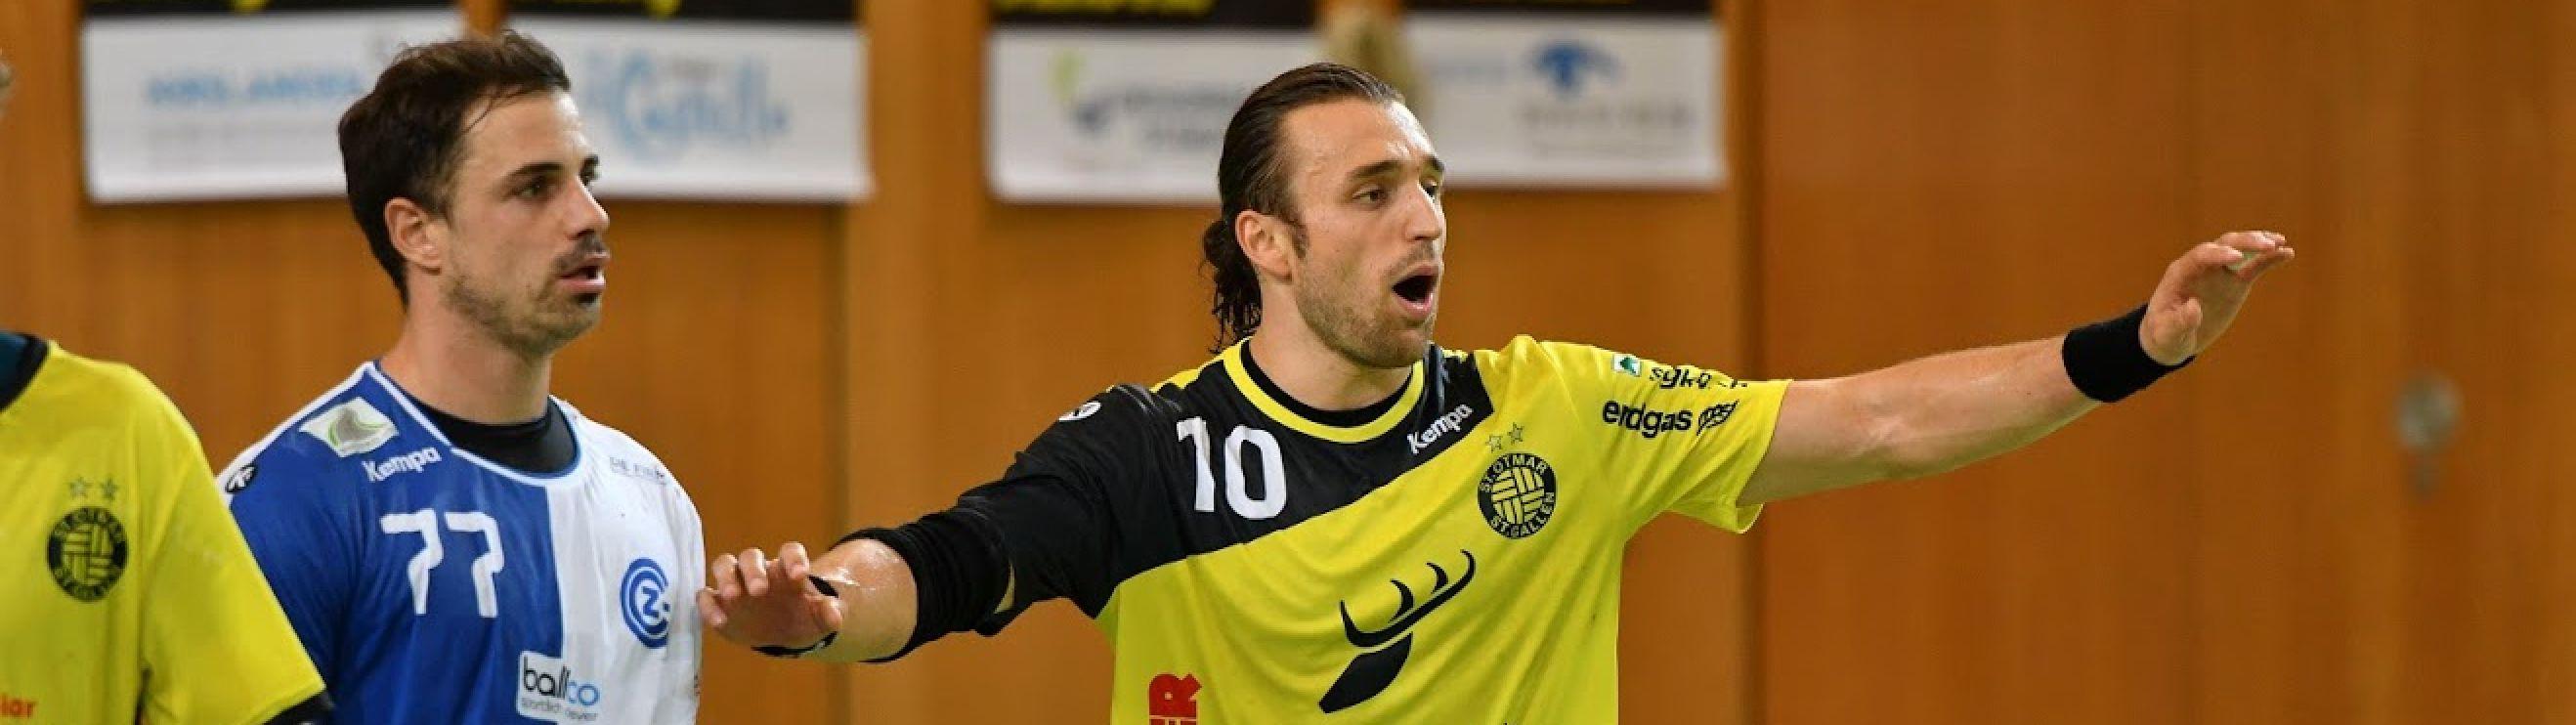 MNLA: TSV St. Otmar St. Gallen – Wacker Thun